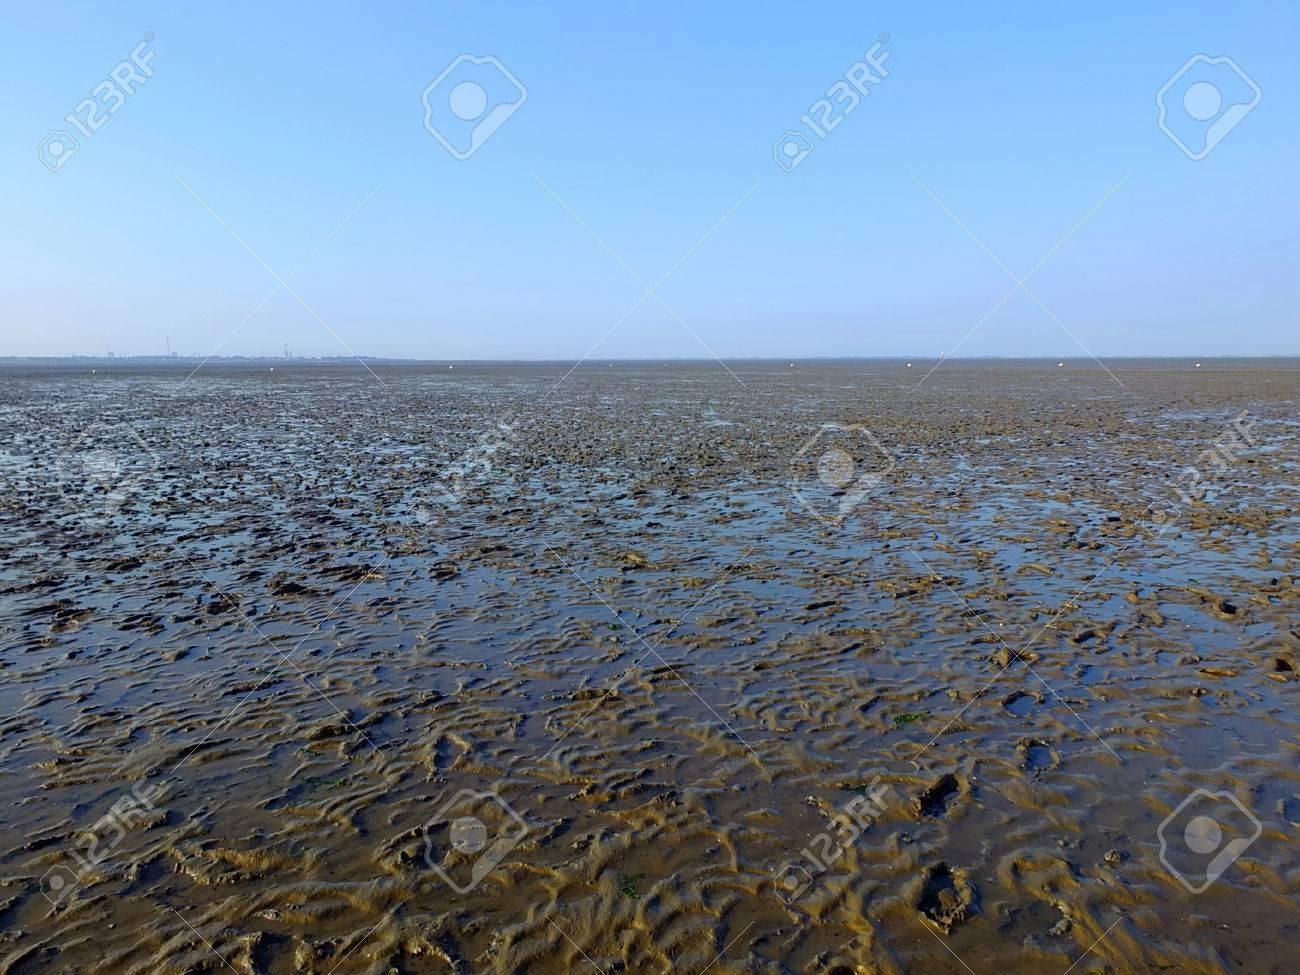 The Wadden Sea in northern Germany Standard-Bild - 47746219